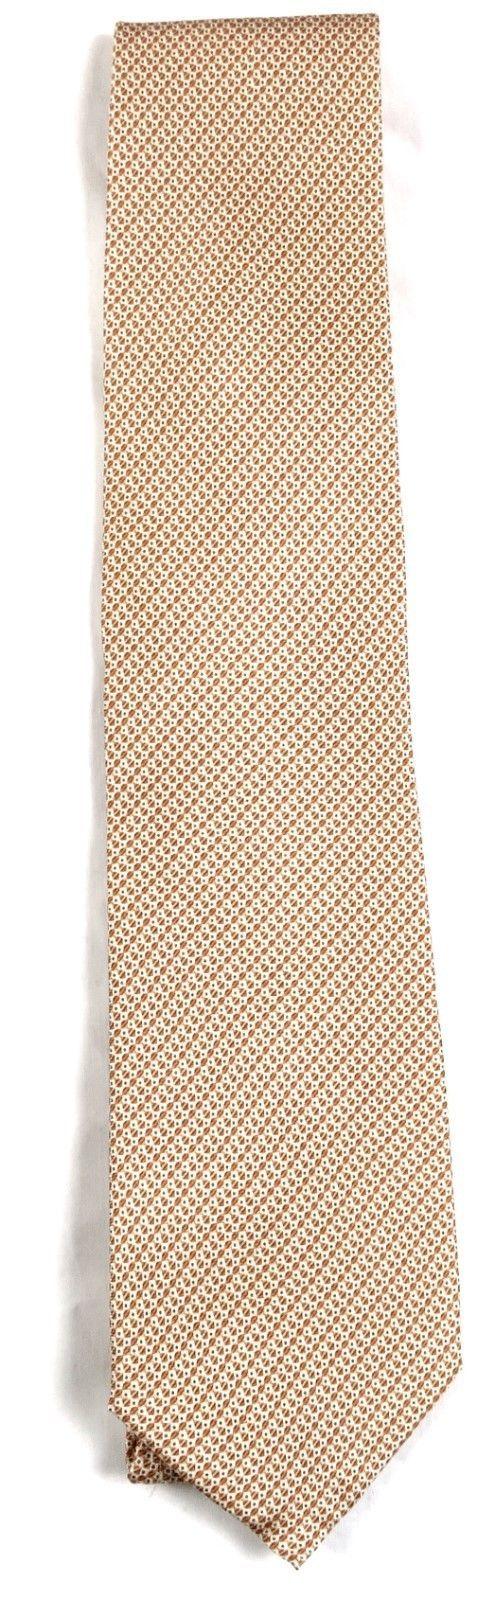 Tommy Bahama Men's Tie Classic Necktie 100% Silk Licensed Island Hop Orange